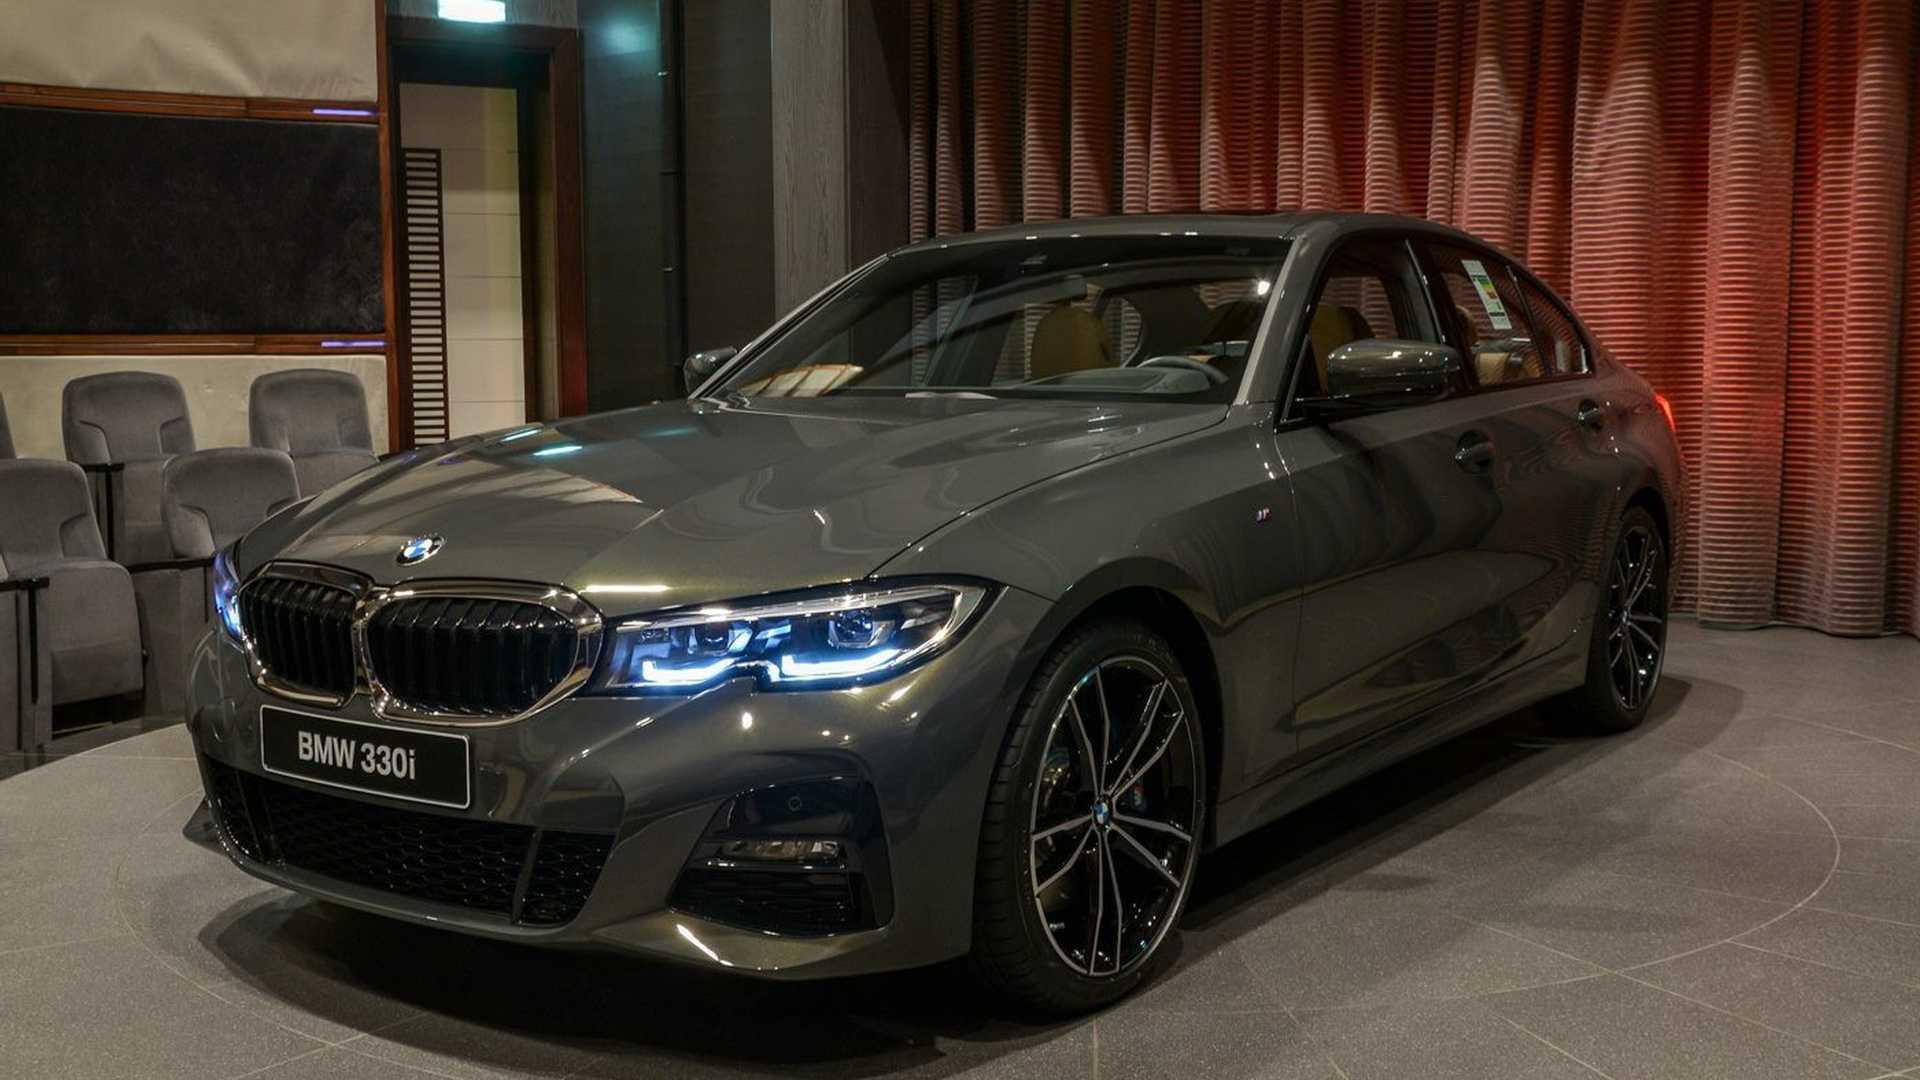 GRİSİ BİLE GÜZEL: 2019 BMW 3 SERİSİ INDIVIDUAL